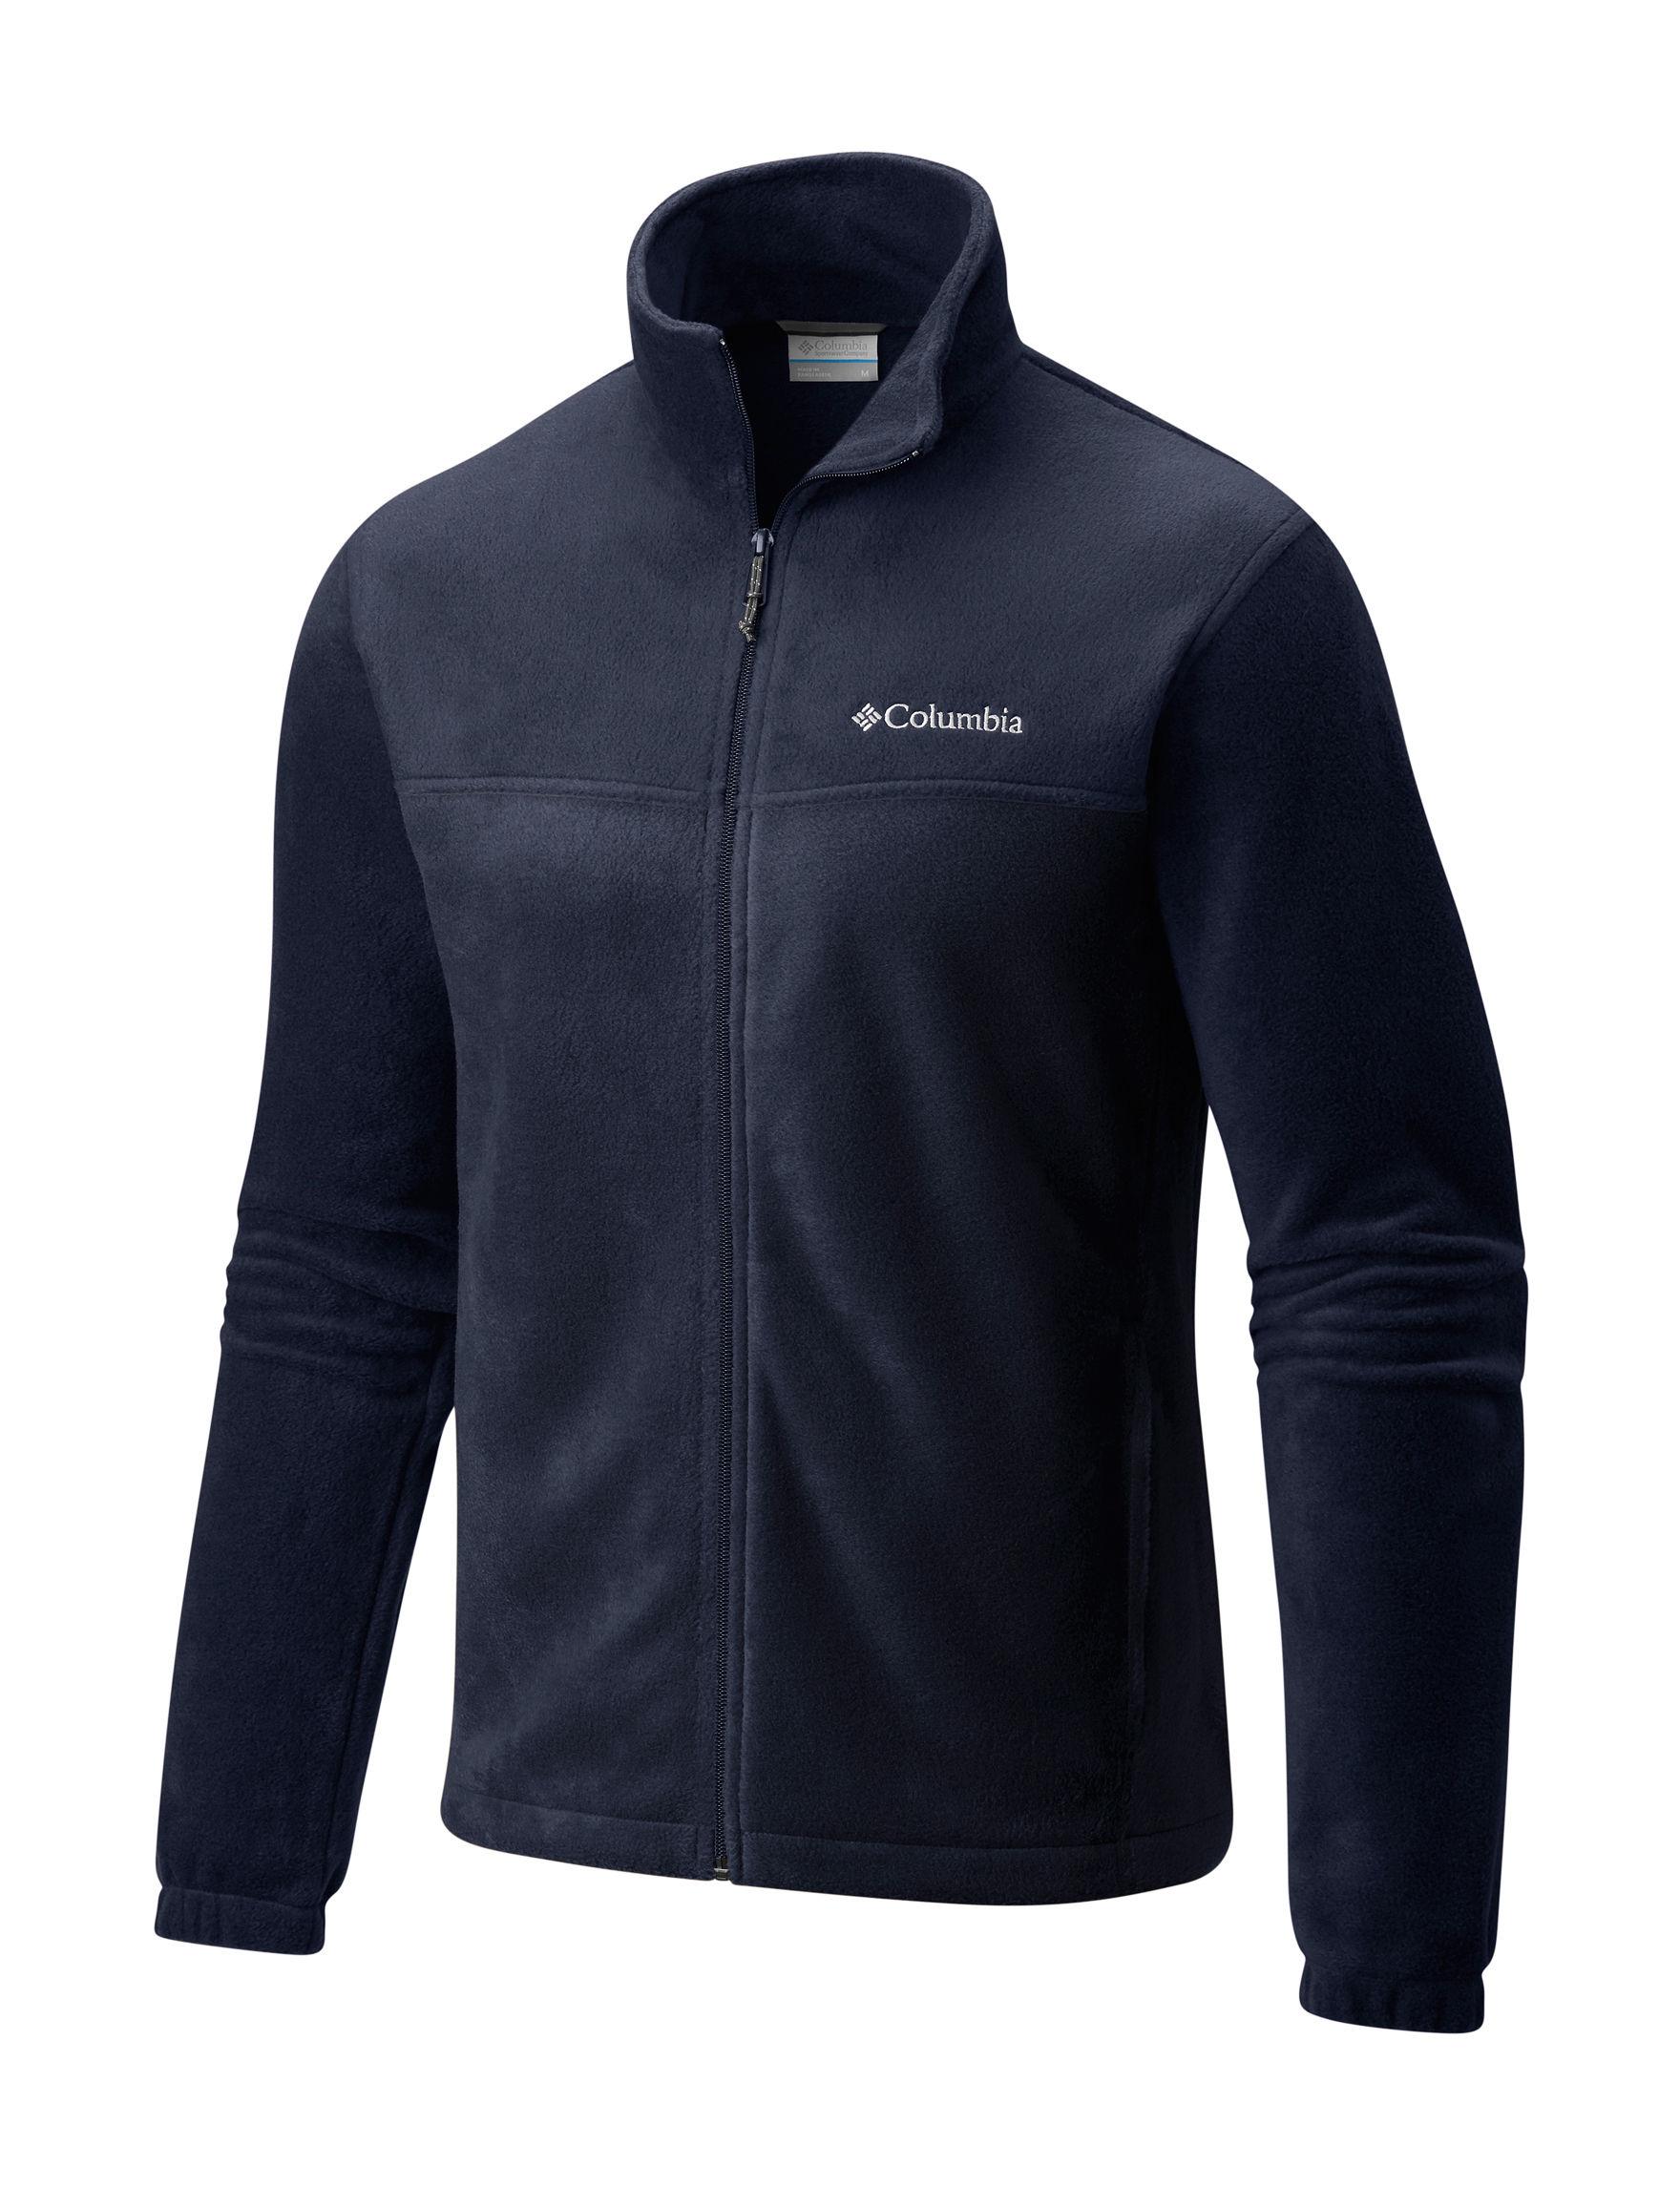 Columbia Navy Fleece & Soft Shell Jackets